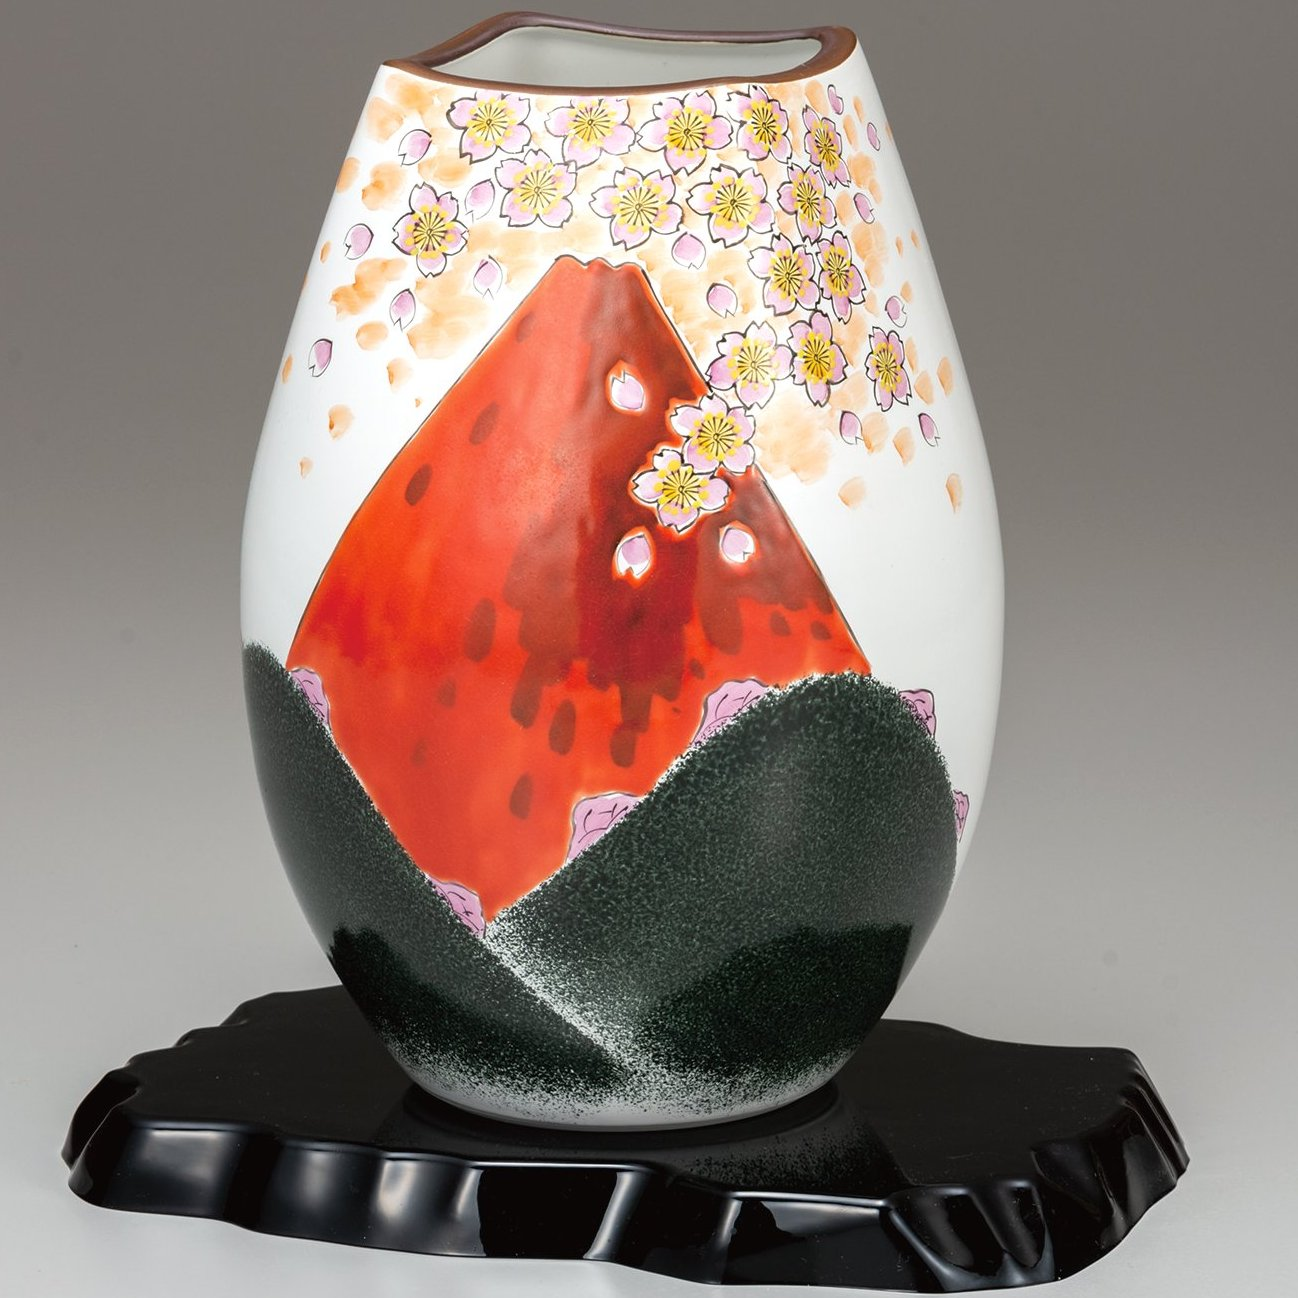 九谷焼ギフト ご贈答品 御祝い 九谷焼8号花瓶 赤富士(台付)